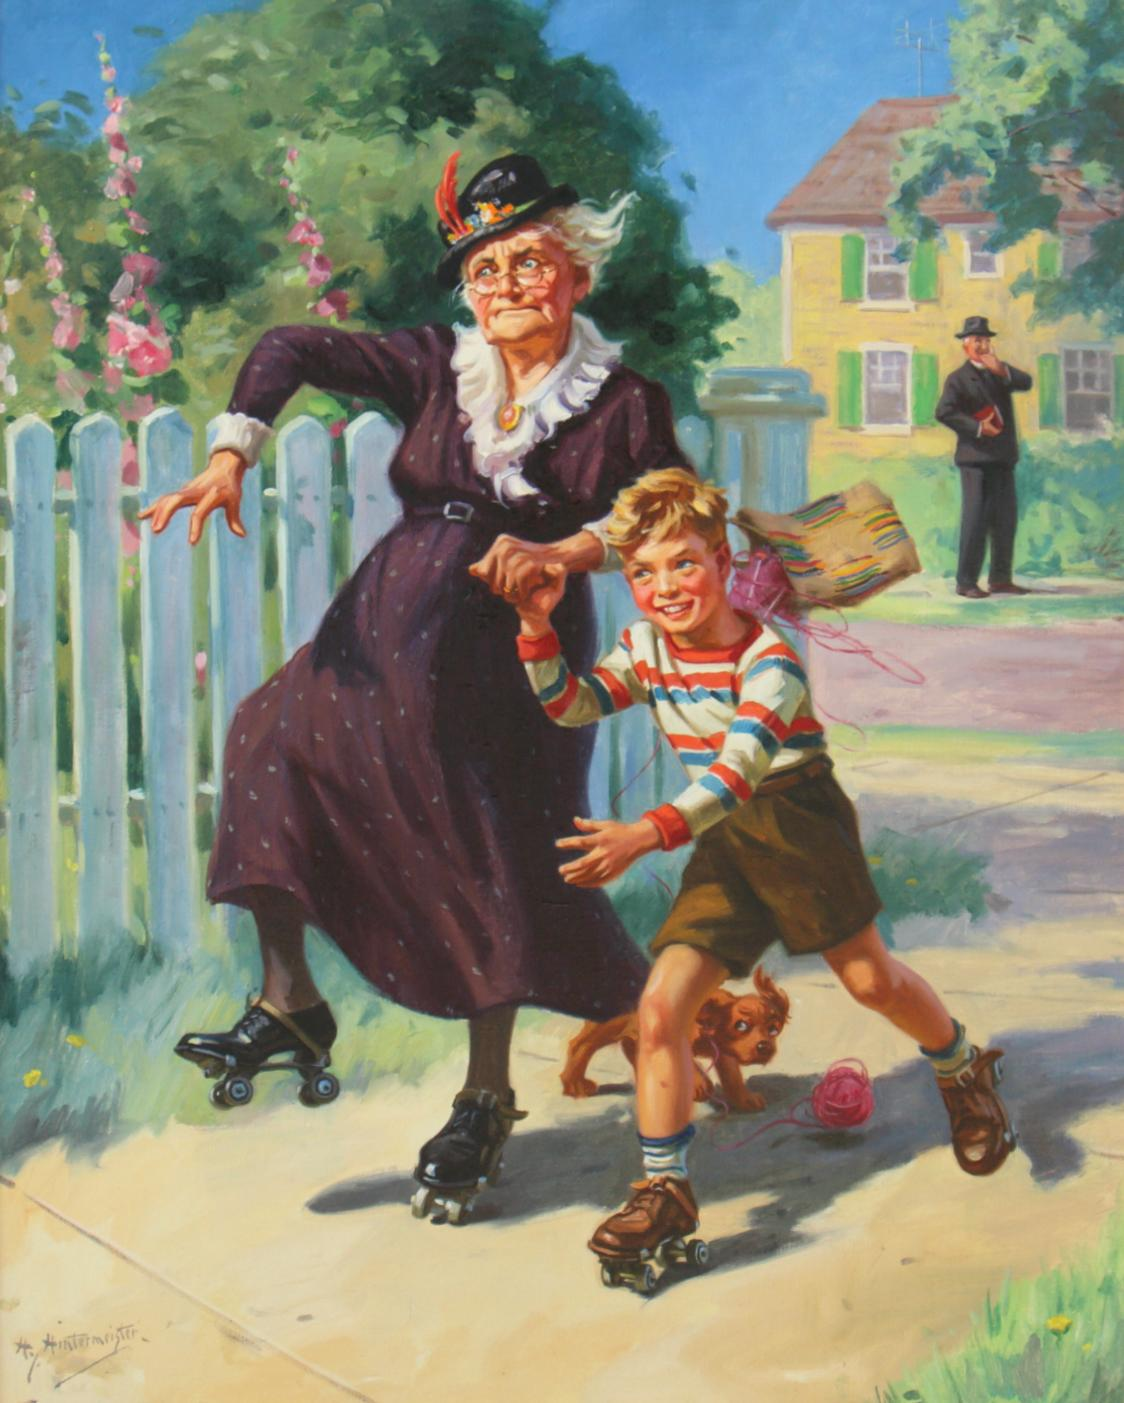 Skating with Granny